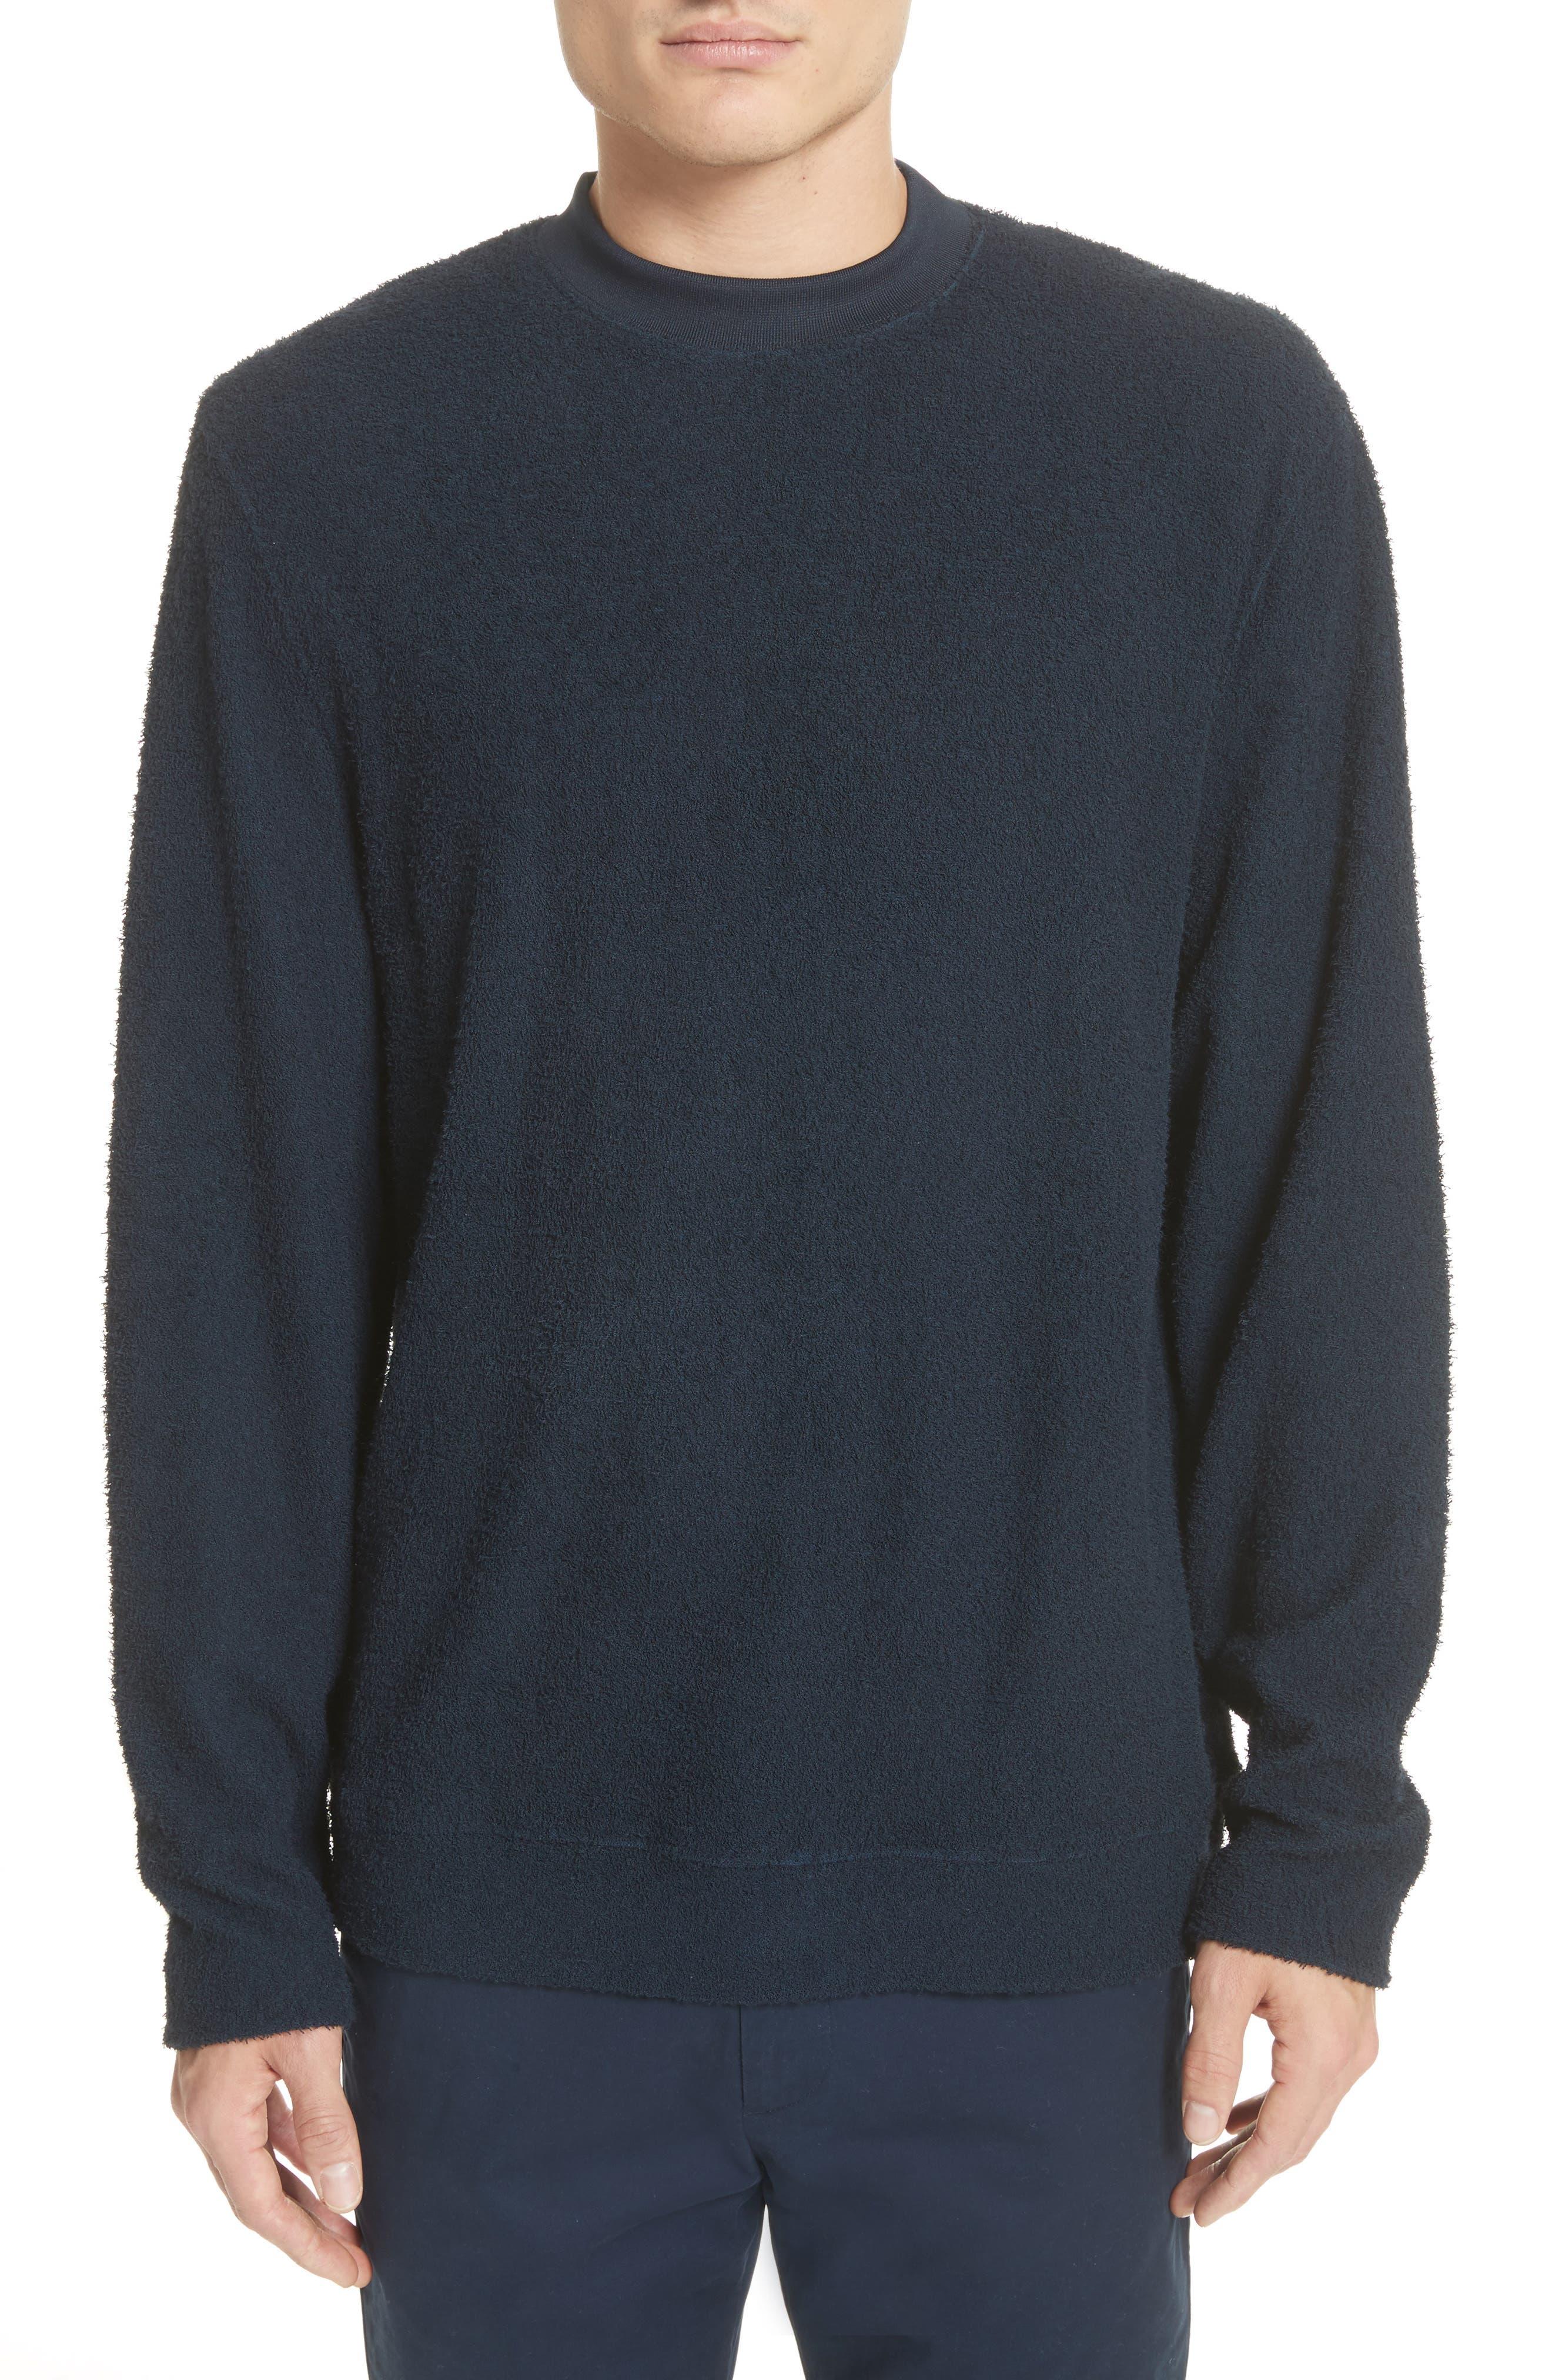 Rask Crewneck Sweatshirt,                             Main thumbnail 1, color,                             Dark Navy